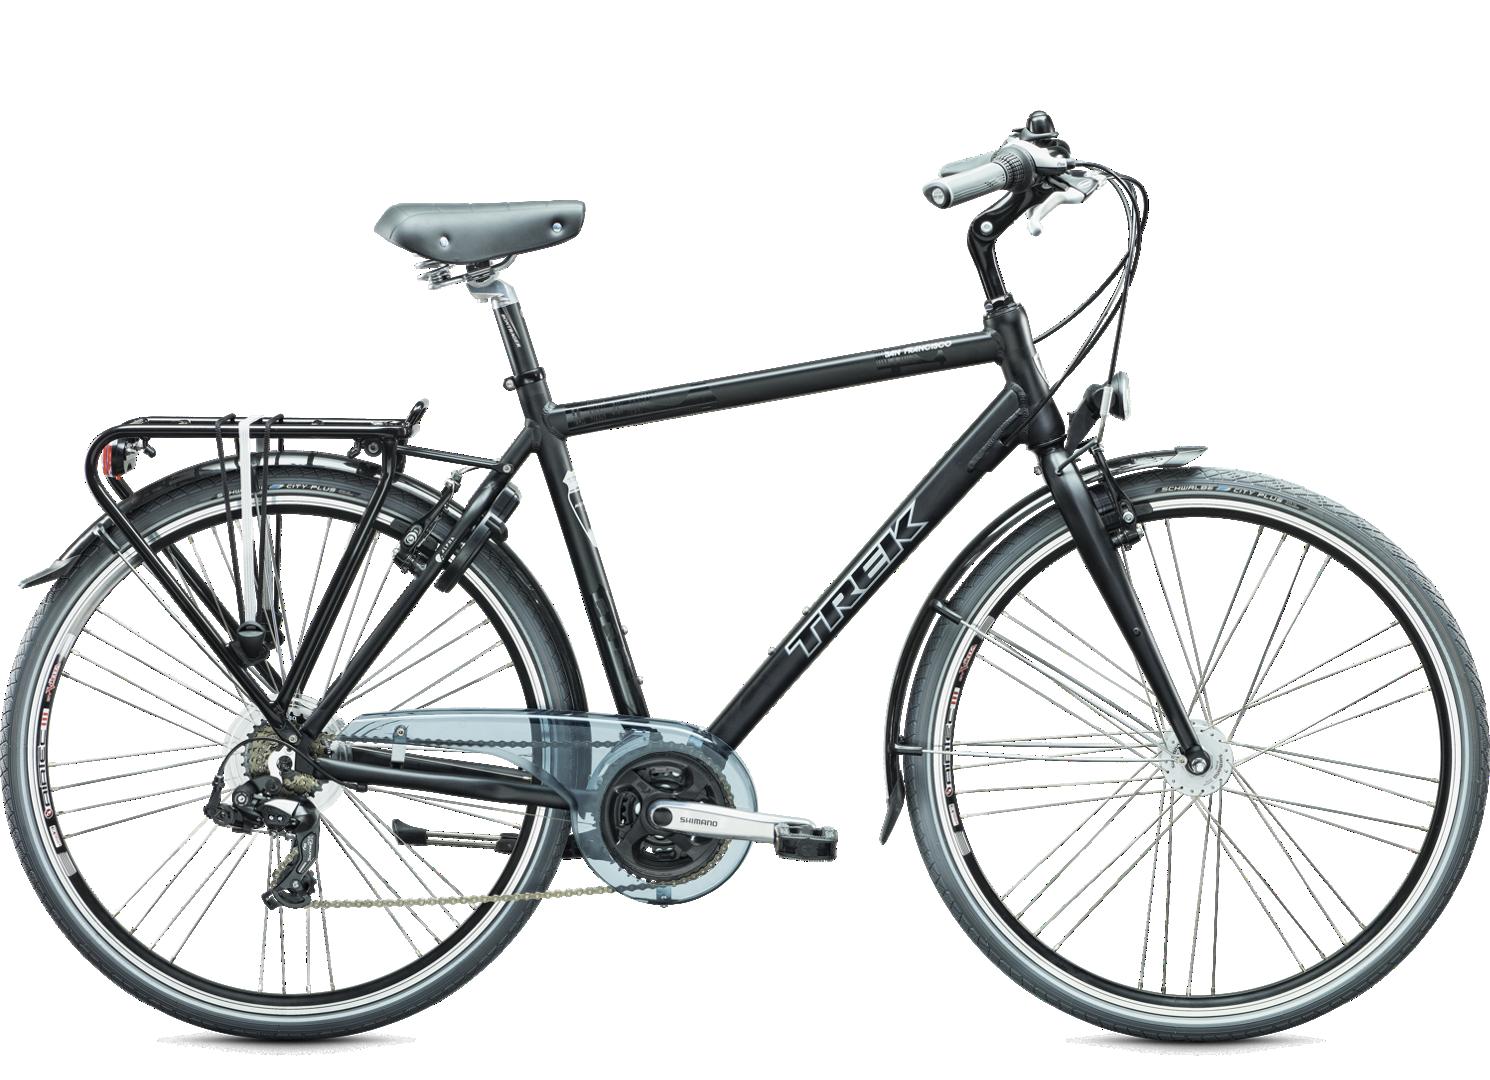 2013 San Francisco 21-Speed BLX - Bike Archive - Trek Bicycle